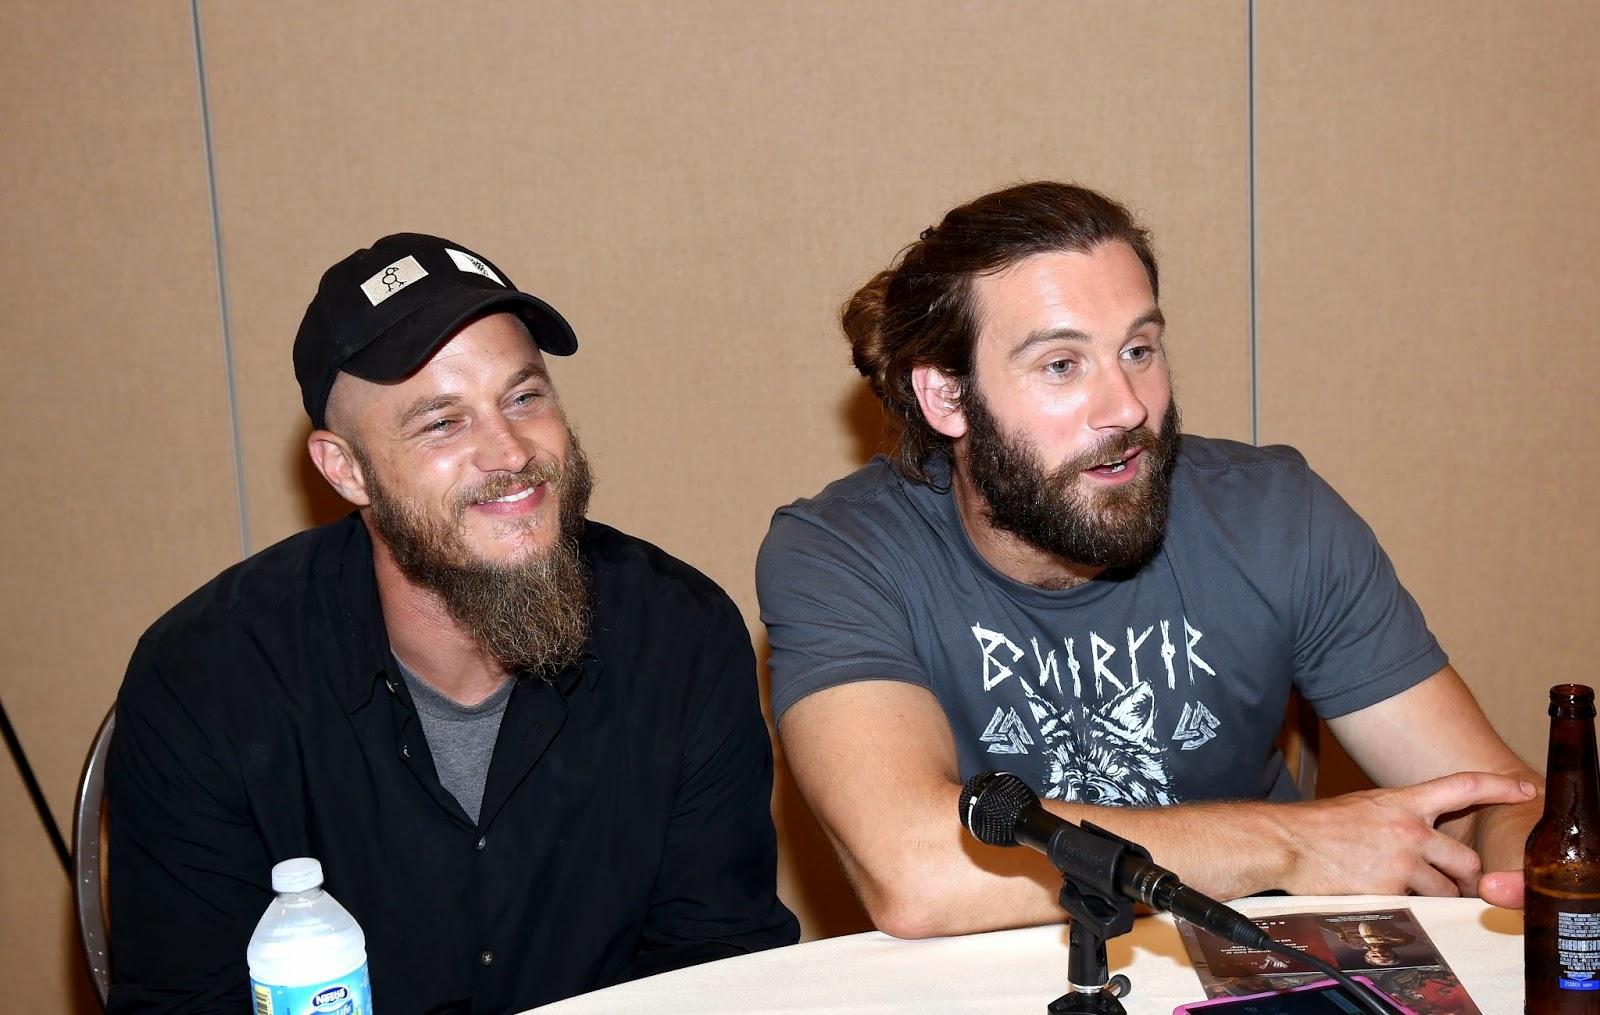 7e26b5a5e542e VIKINGS Season 3 Sneak Peak Video   Images From Comic-Con 2014 -  sandwichjohnfilms